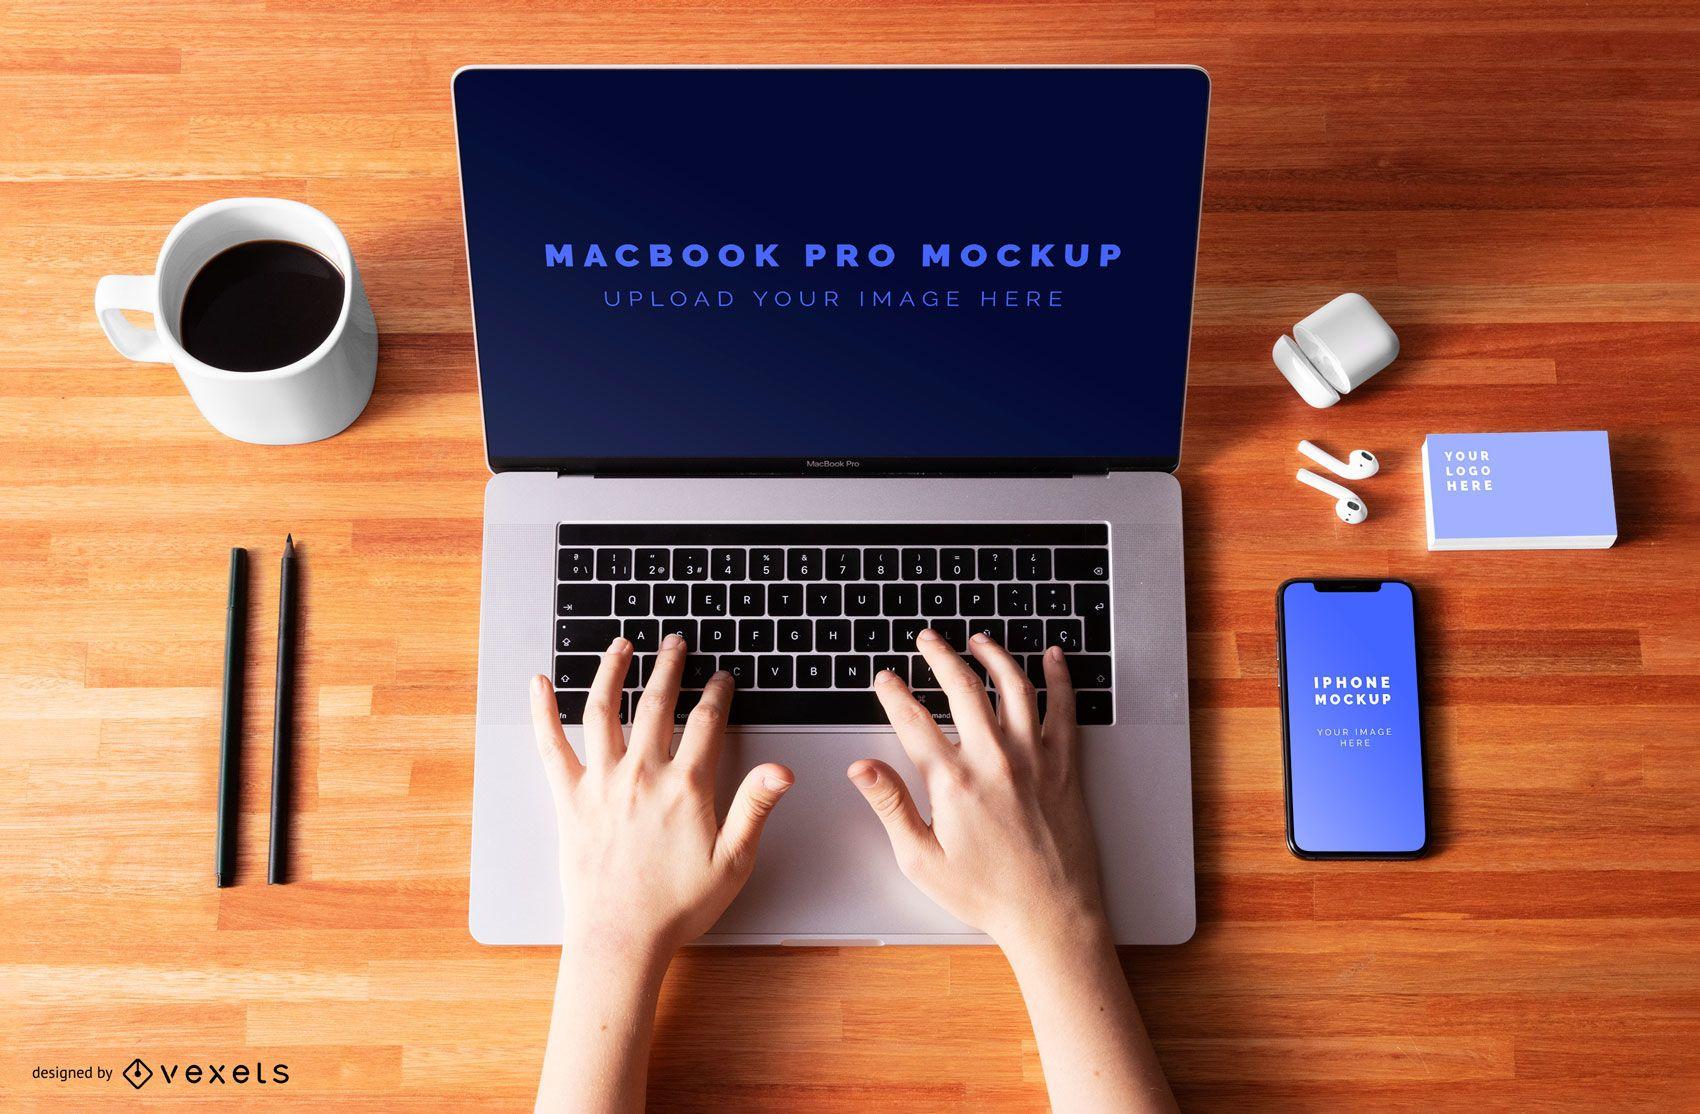 Macbook pro mockup composition